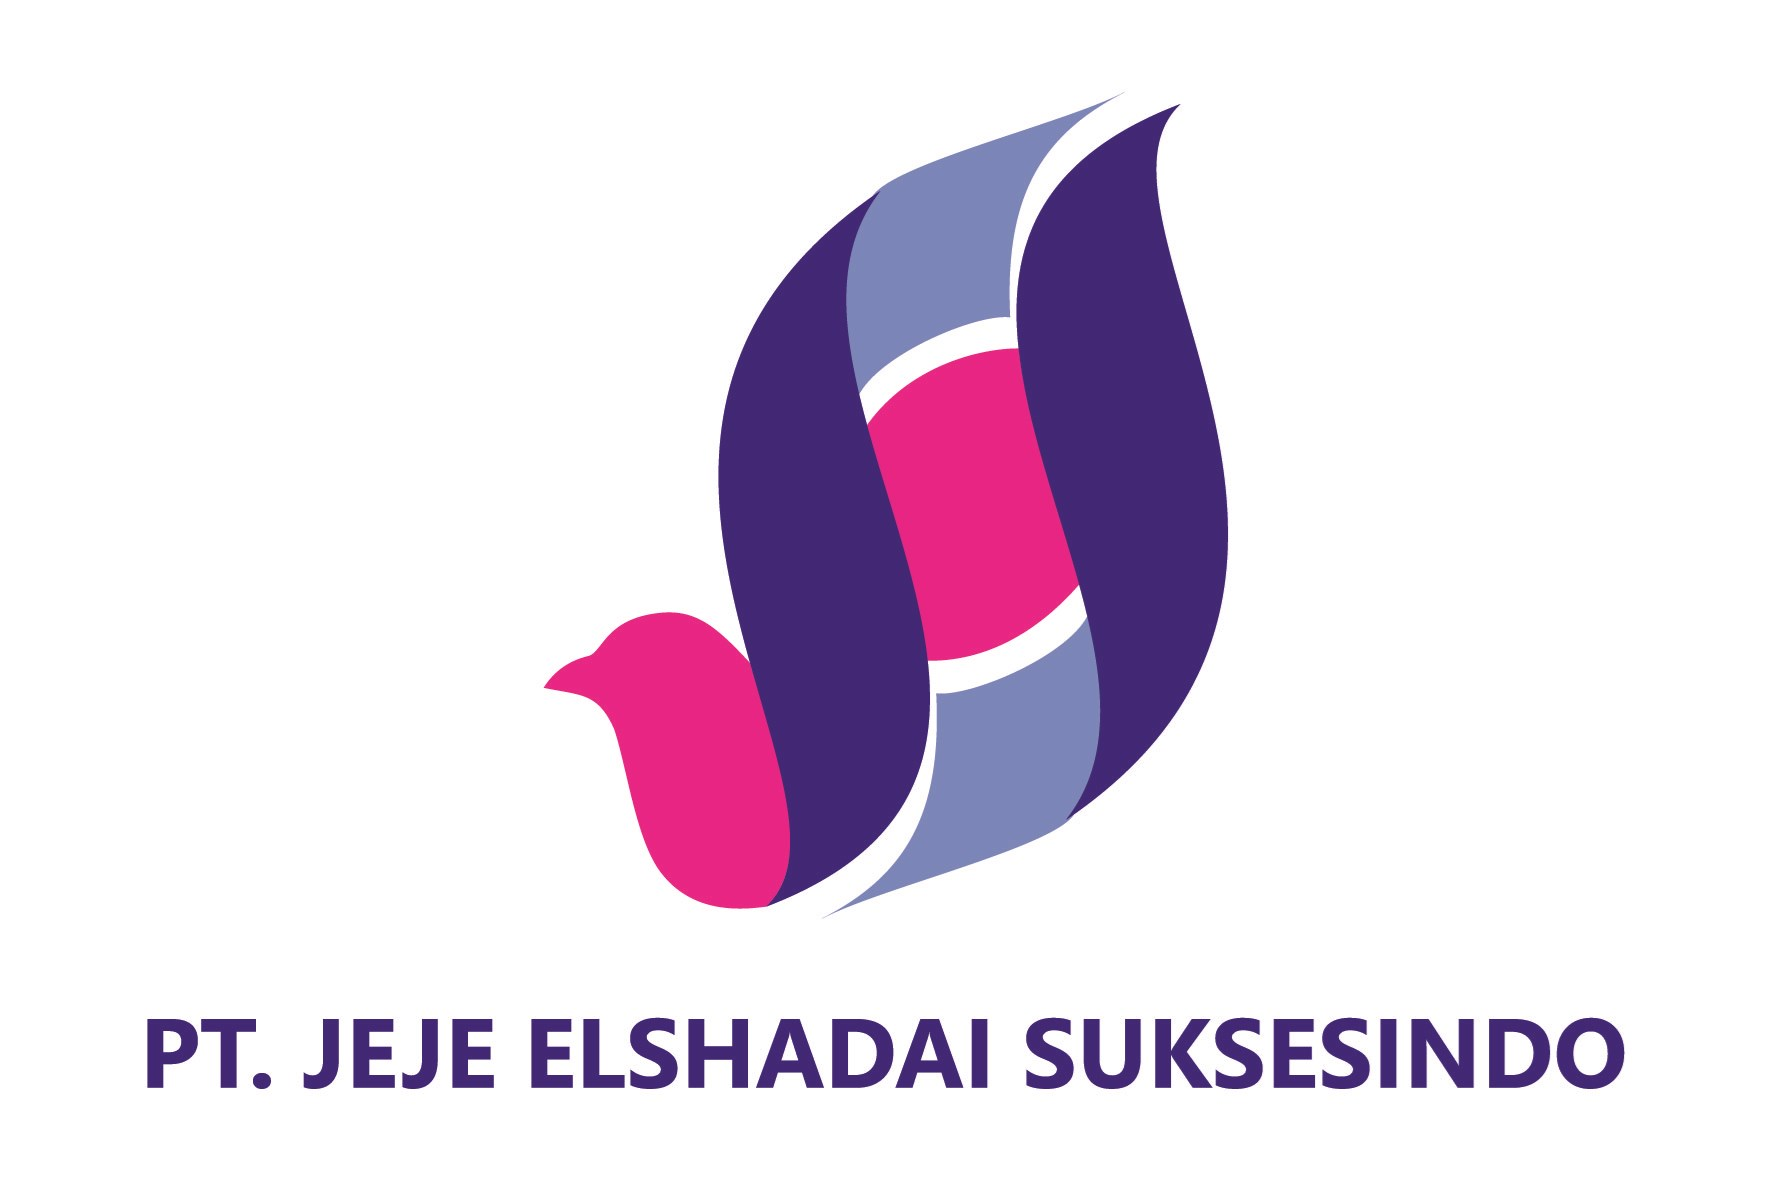 Jeje Elshadai Suksesindo